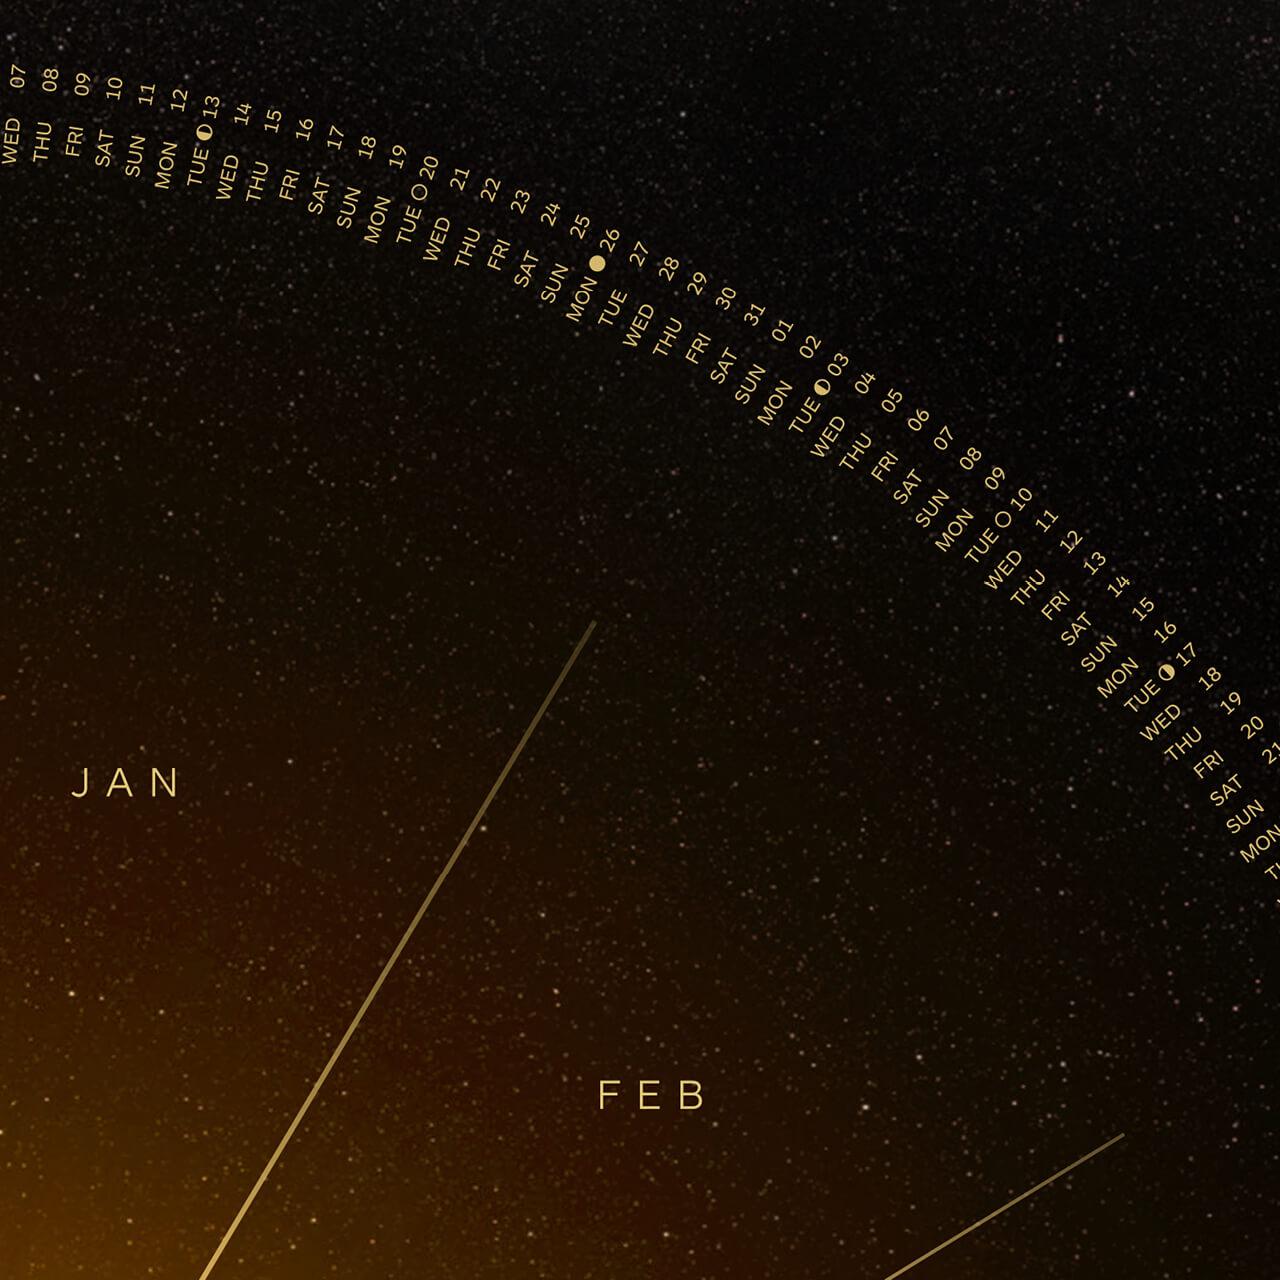 solarcalendar-2016-detail8